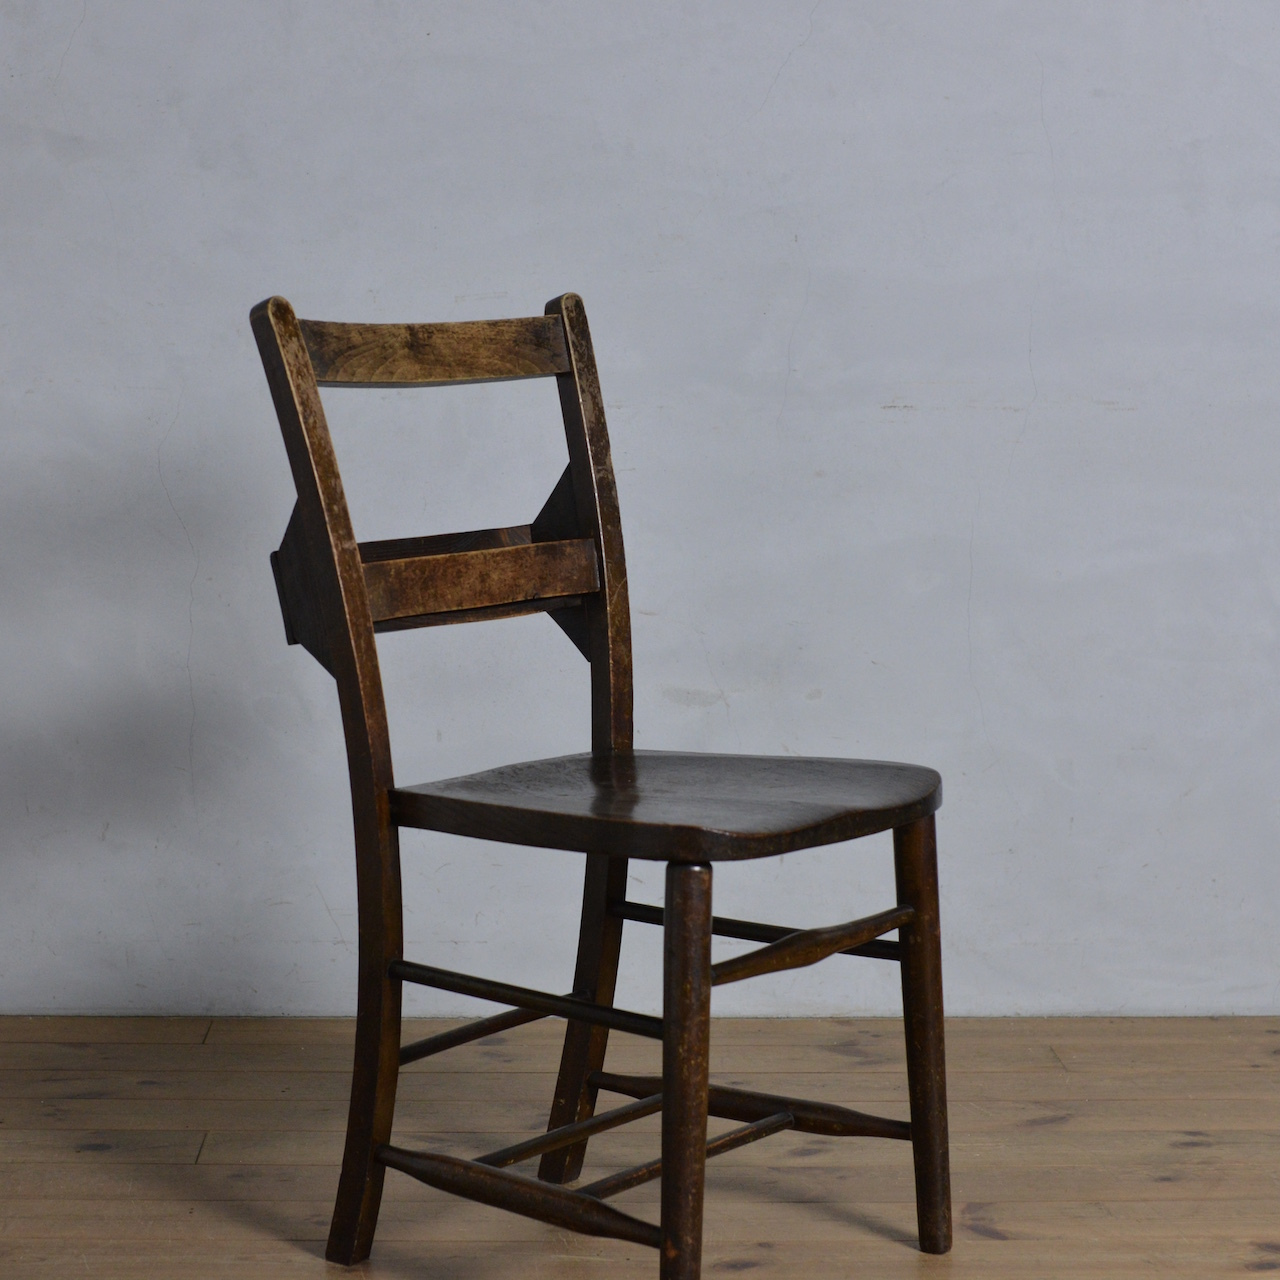 Church Chair / チャーチチェア 【B】〈チャペルチェア・ダイニングチェア・デスクチェア・椅子〉SW2101-0002【B】